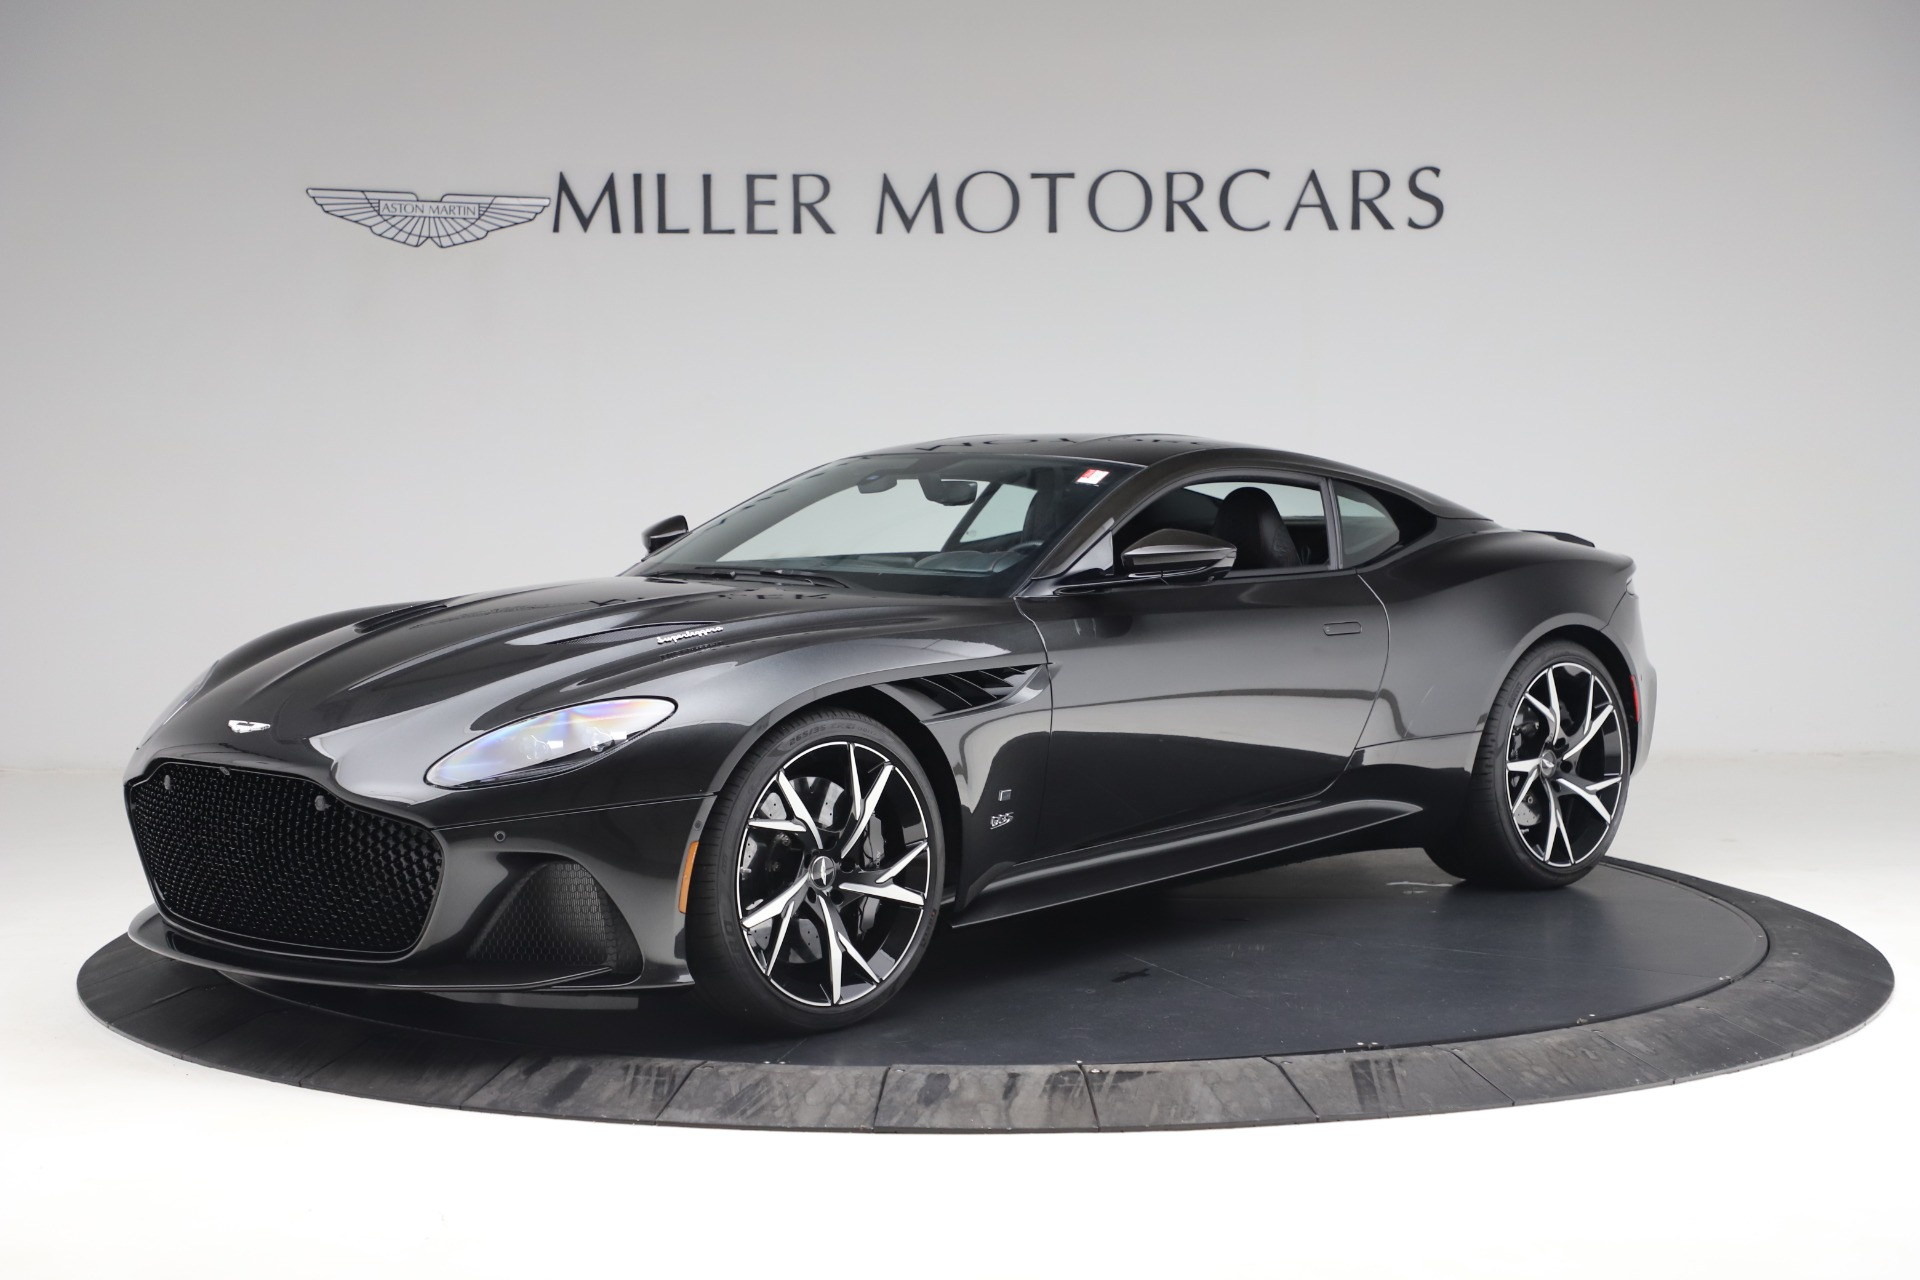 New 2021 Aston Martin DBS Superleggera 007 for sale $391,211 at Alfa Romeo of Greenwich in Greenwich CT 06830 1